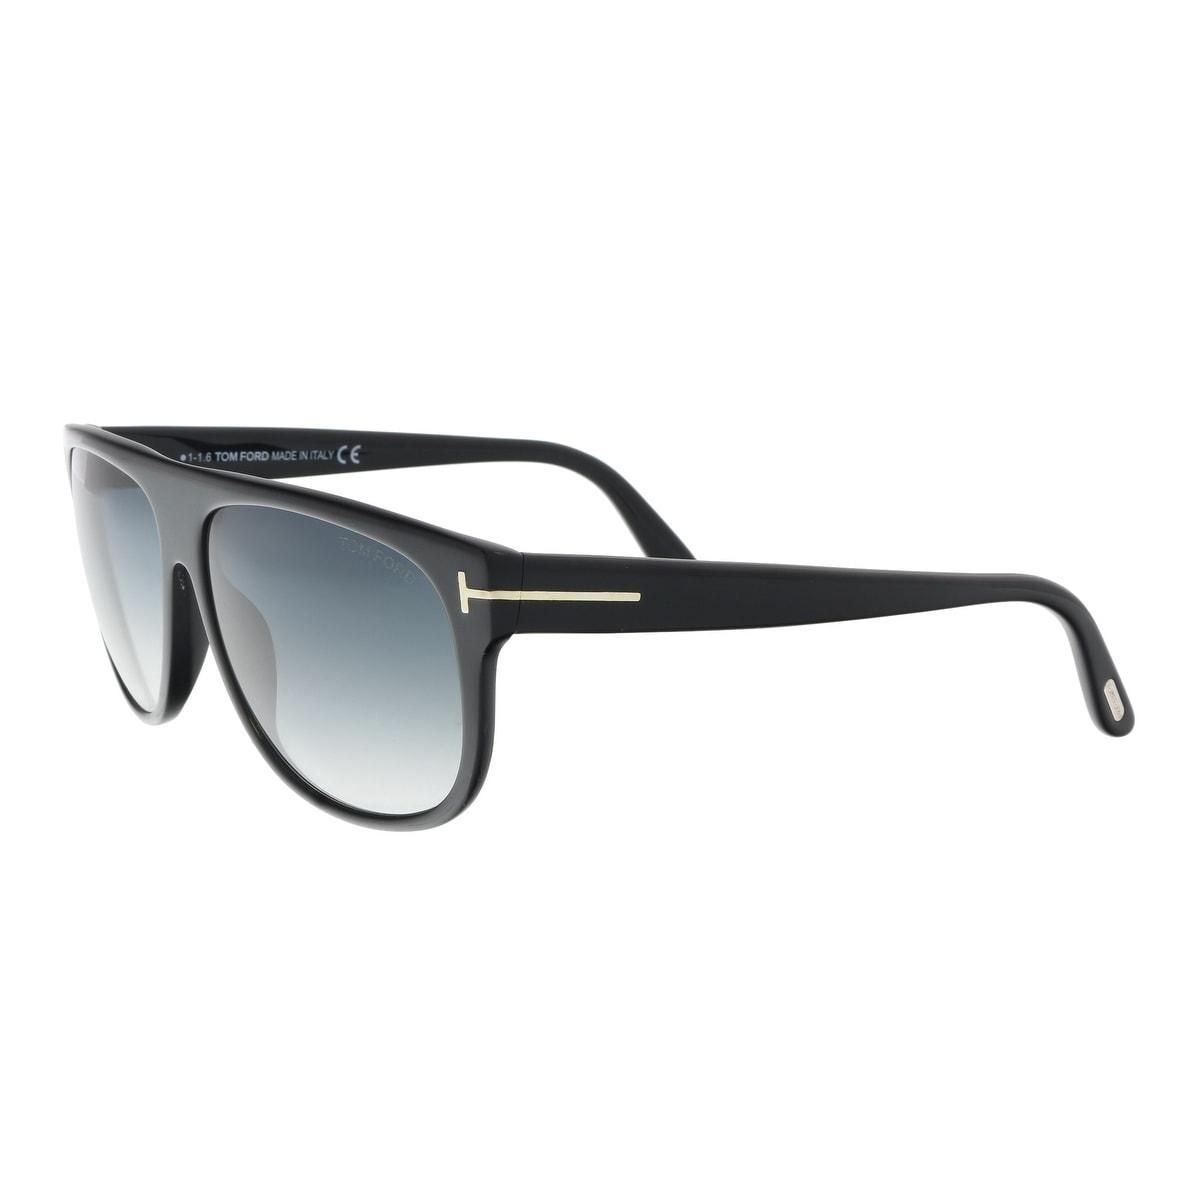 0516ca7ad996 Tom Ford Women s Sunglasses